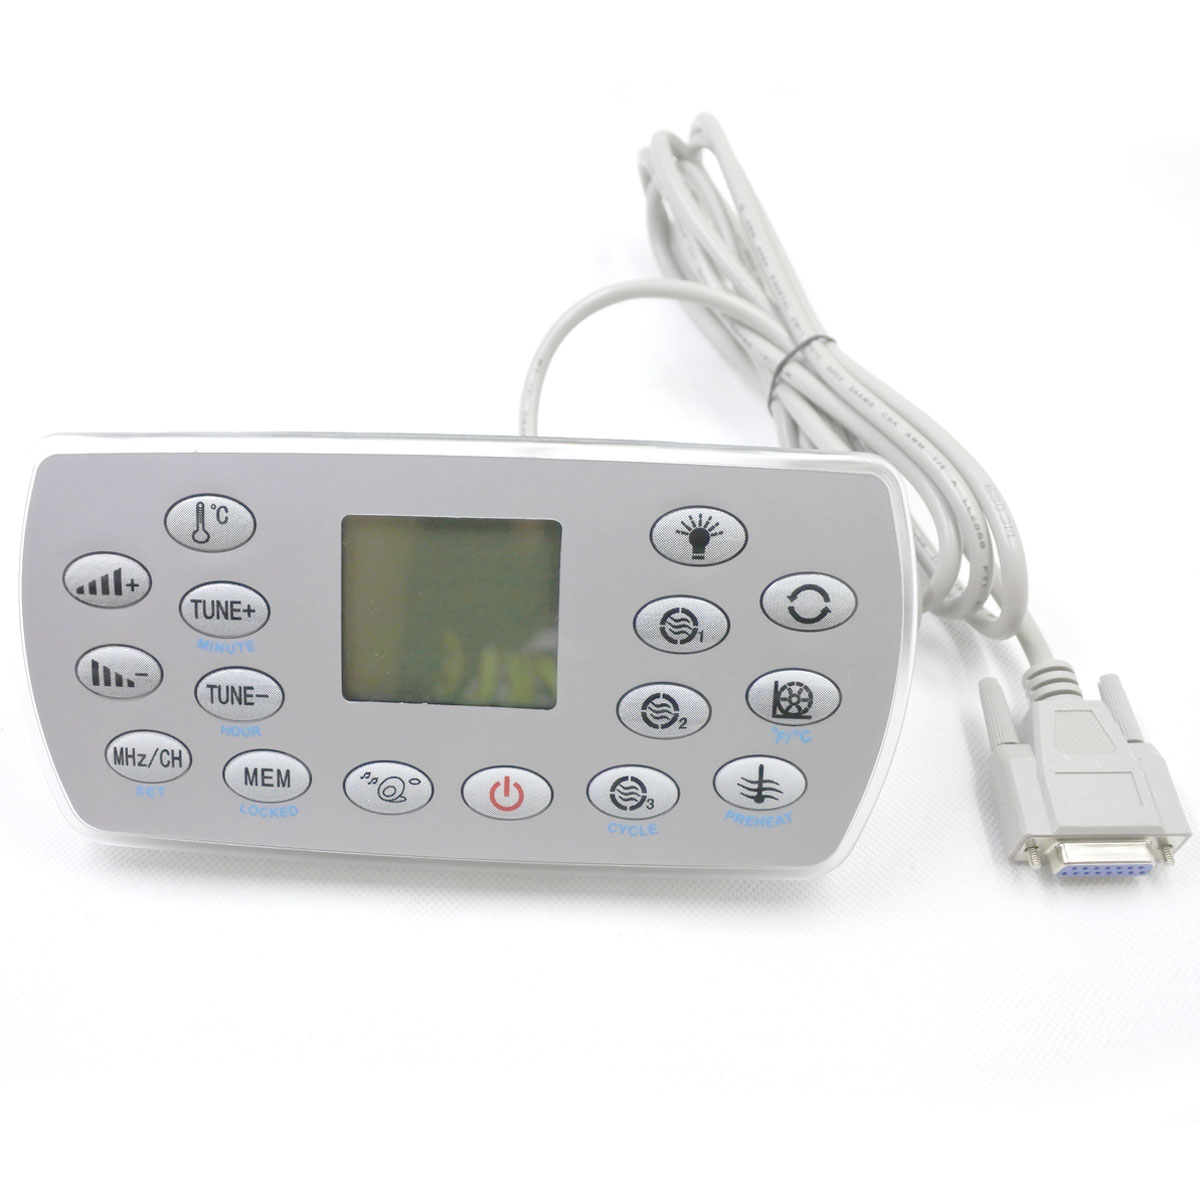 KL8-3 Spa Keypad With White Lock Backside, Hot Tub Controller Panel Fit  For JAZZI,J&J,SERVE,kingston,monalisa,mesda,LX Heater